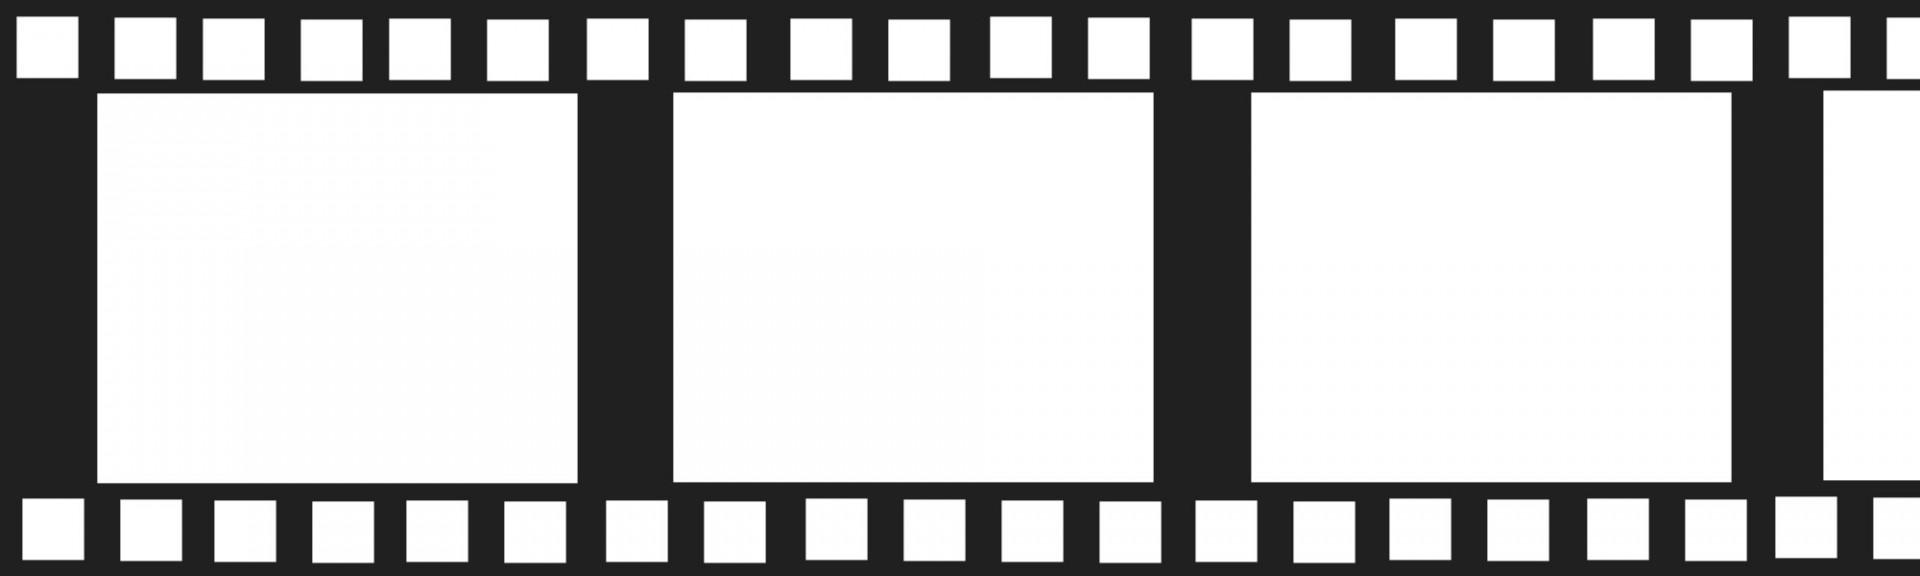 1920x576 Movie Clipart Filmstrip